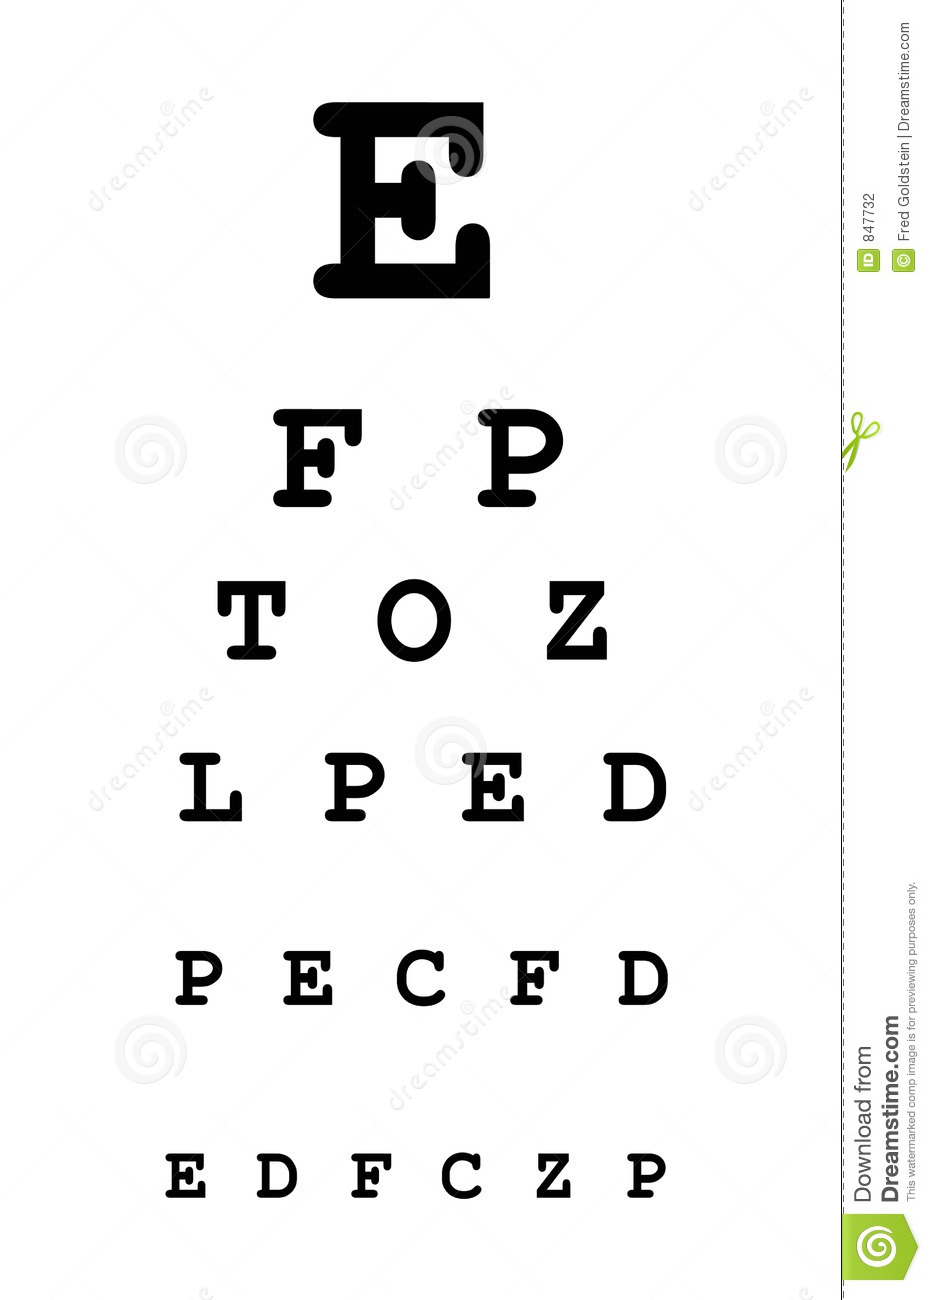 Eye test clipart clipground eye test clipart nvjuhfo Choice Image